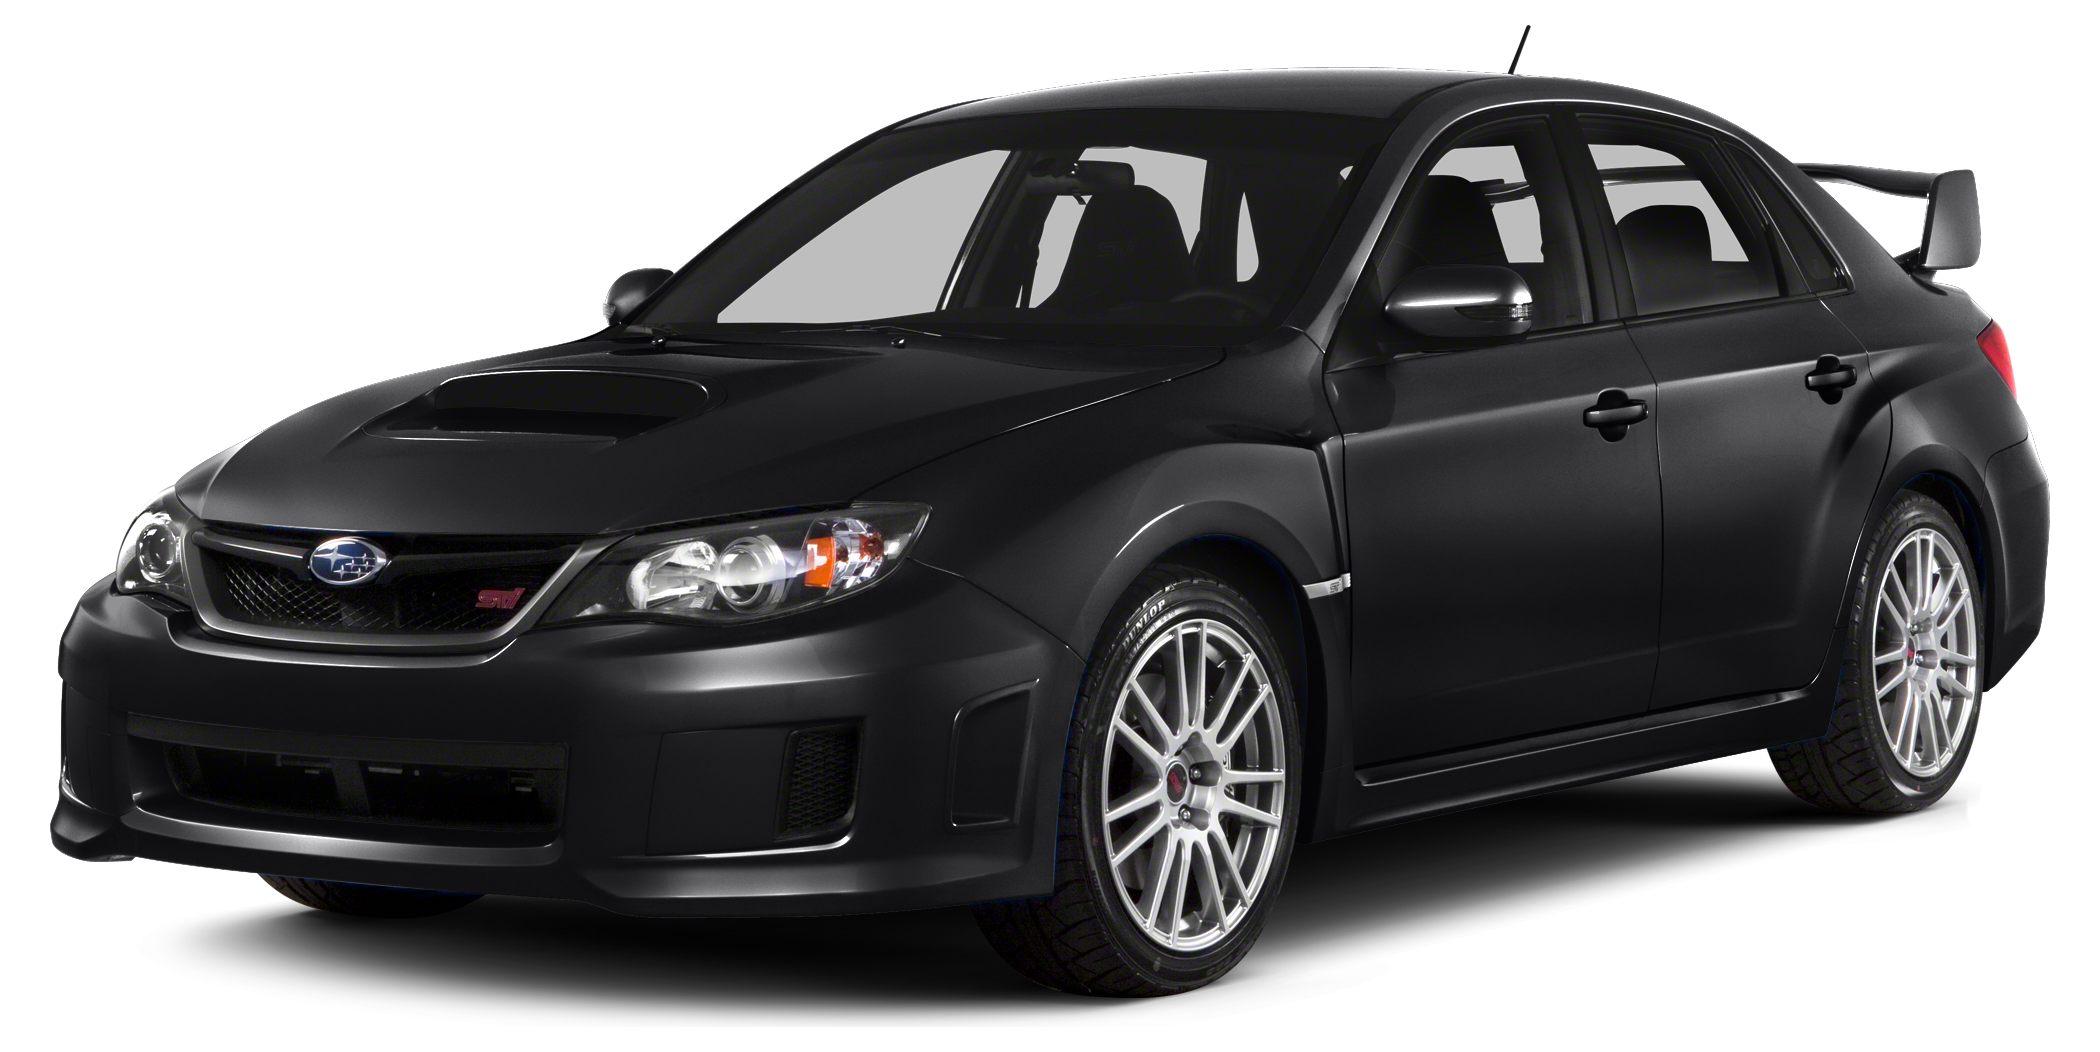 2014 Subaru Impreza WRX STi Miles 10215Color Crystal Black Silica Stock 1821 VIN JF1GV8J63EL